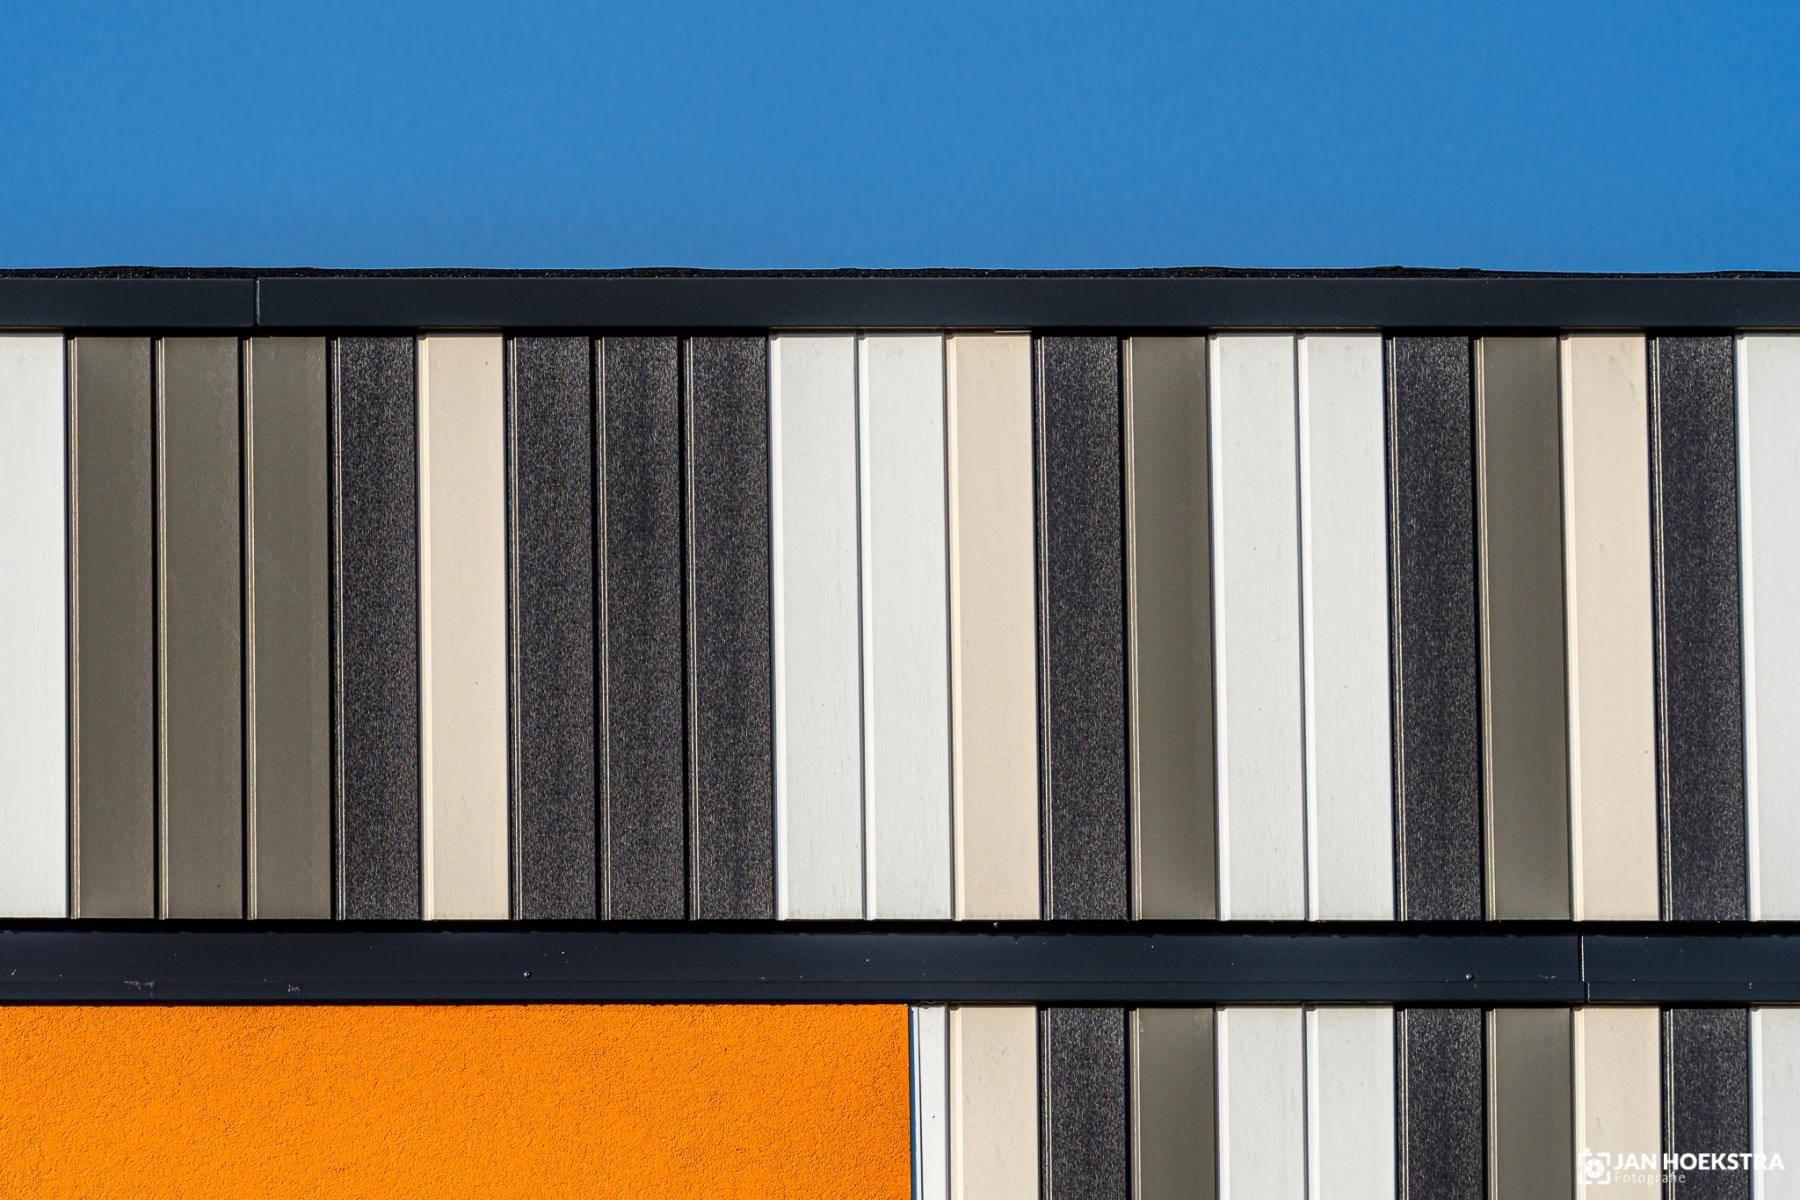 Jan Hoekstra  - Abstract - 01